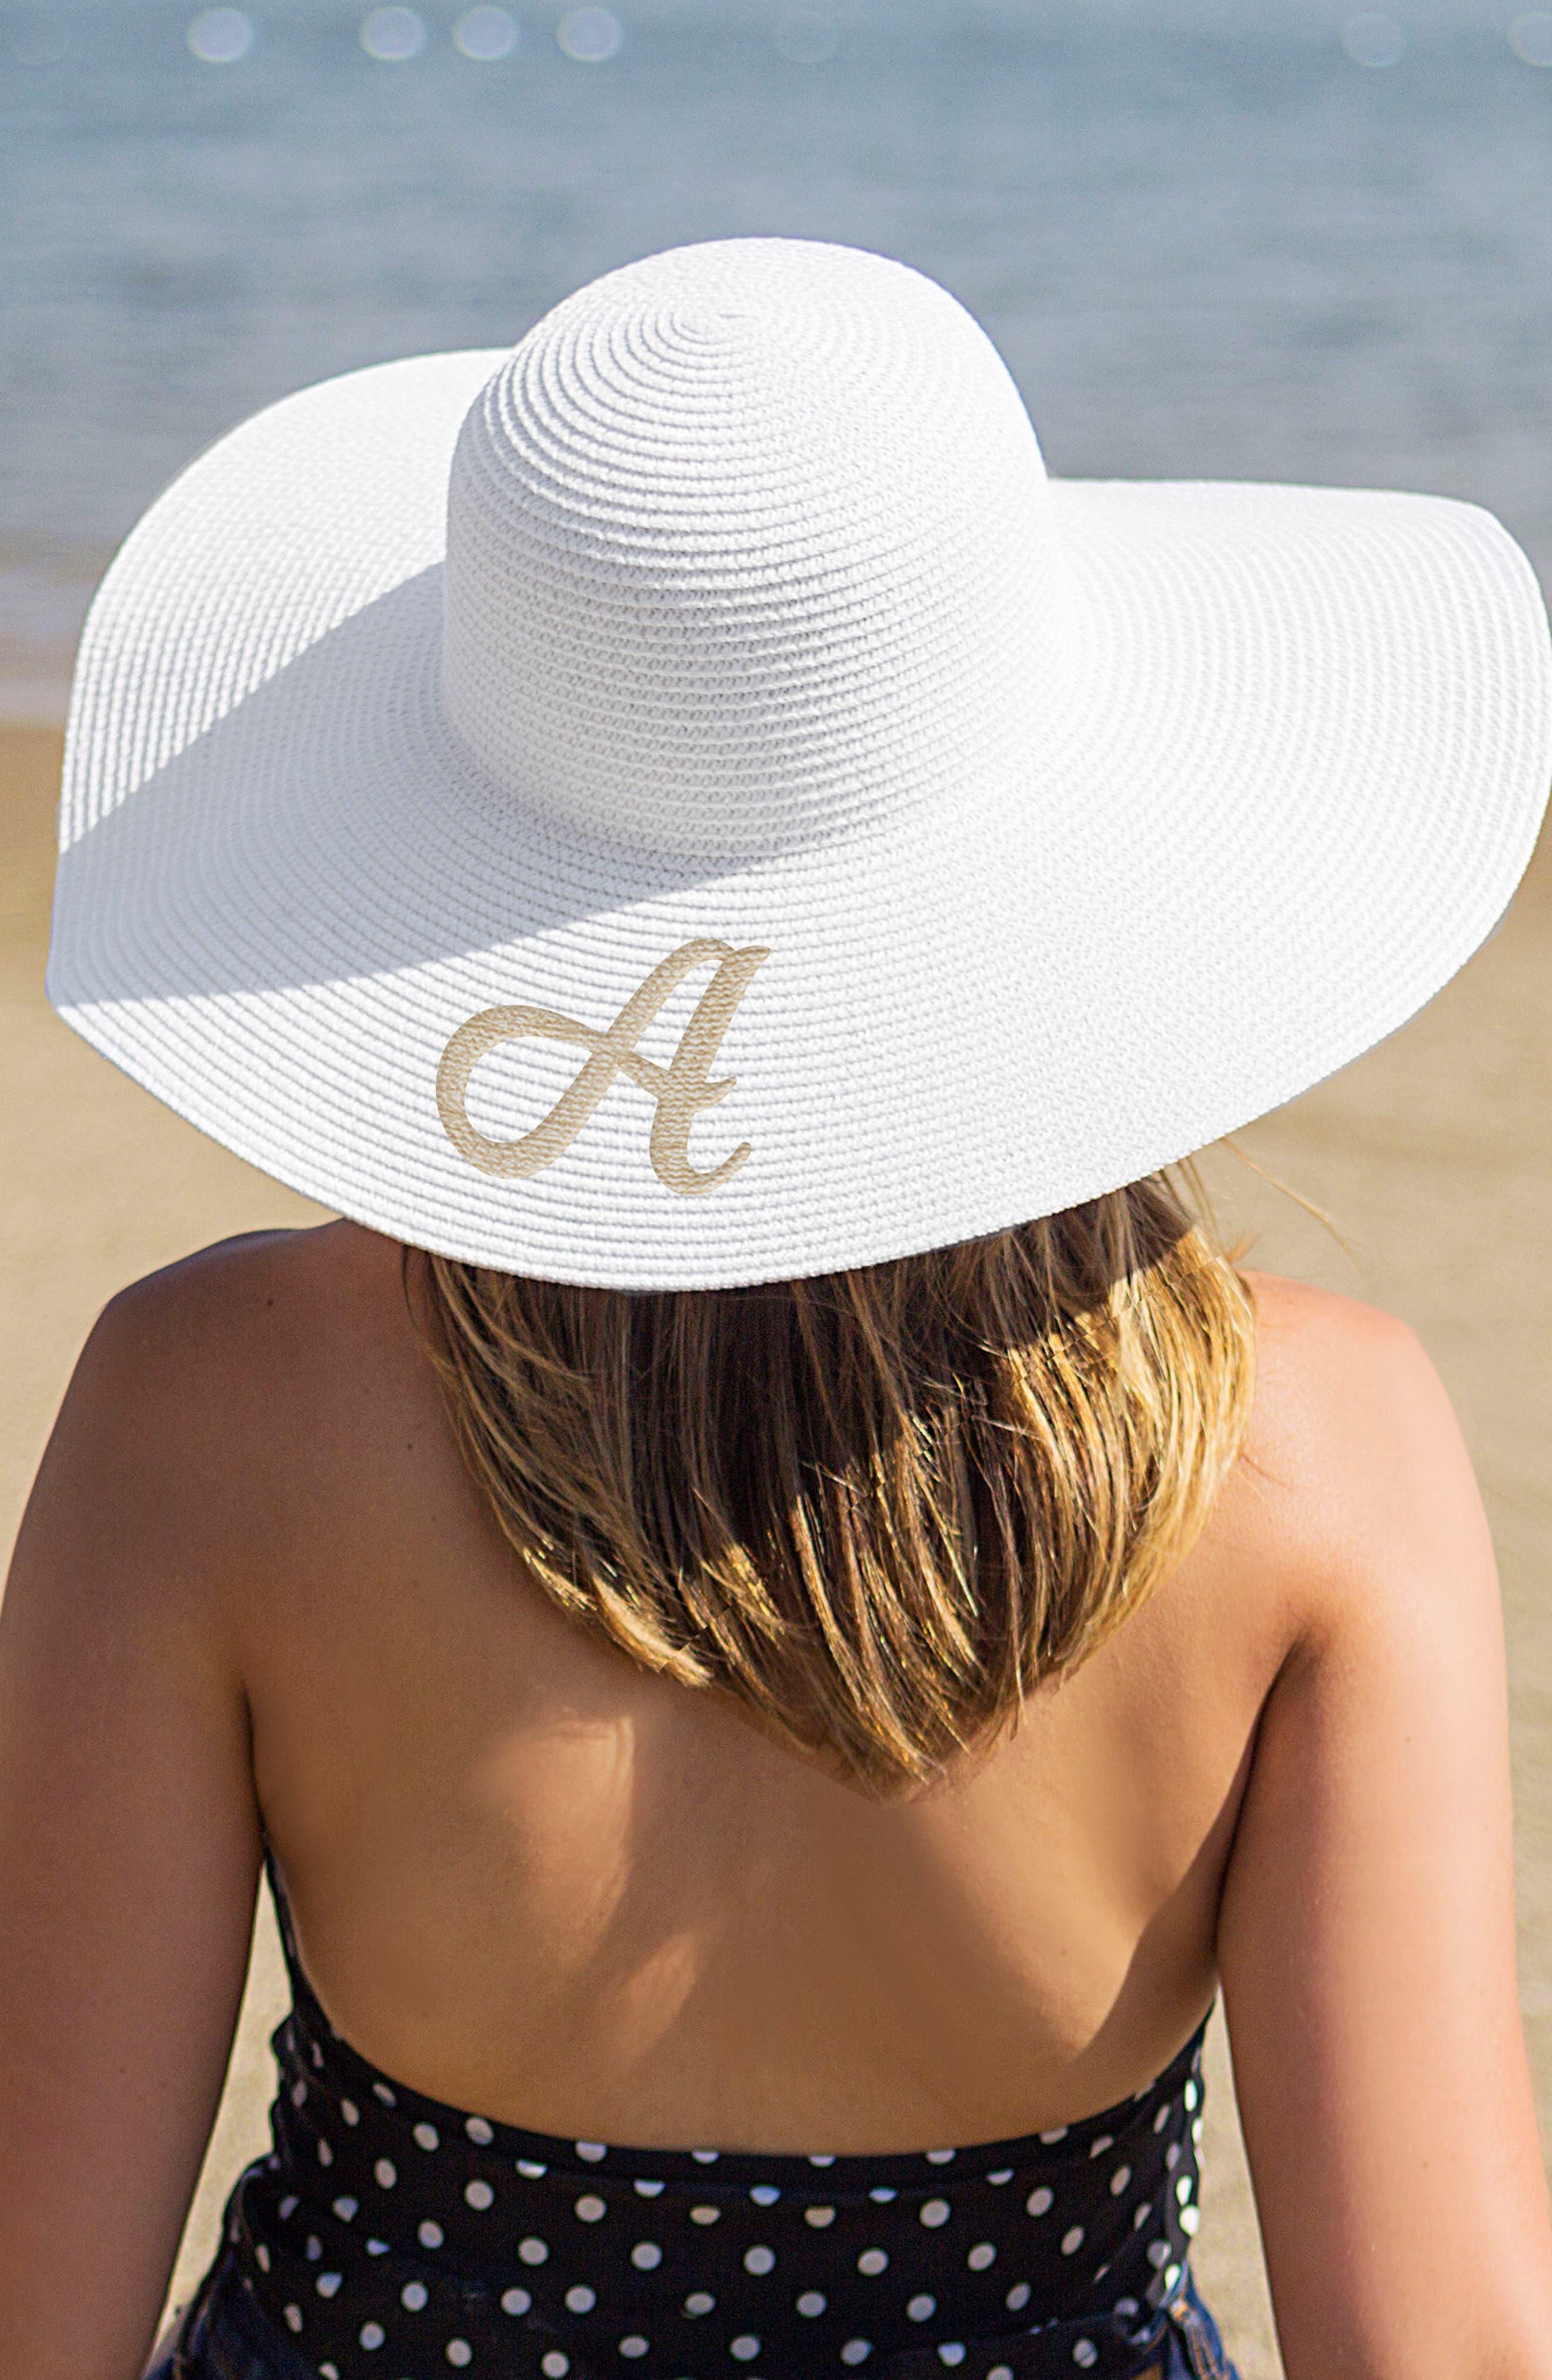 Cathy's Concepts Monogram Straw Sun Hat